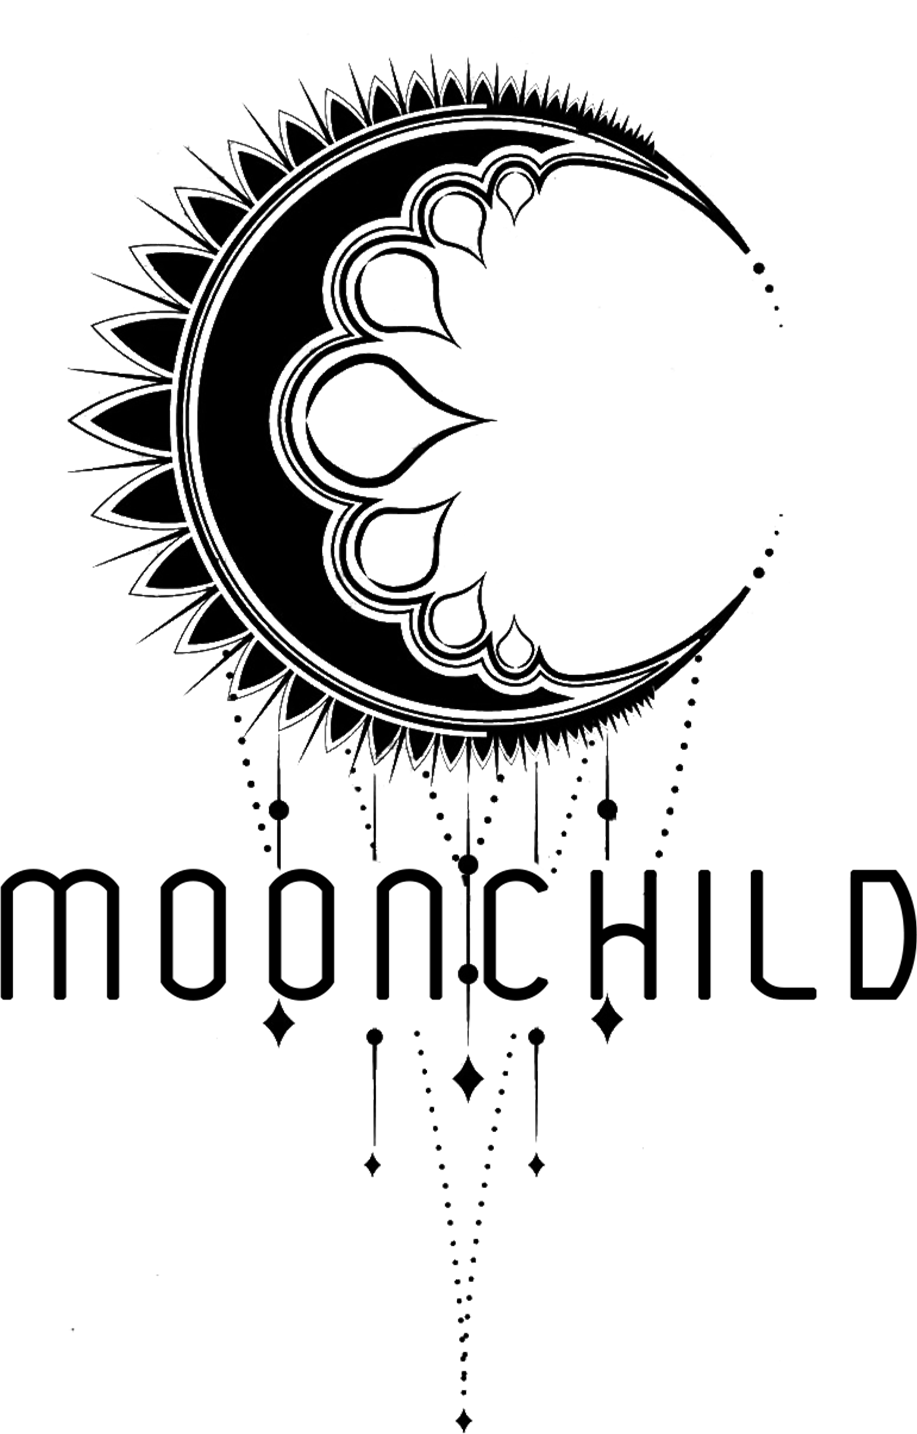 MOONCHILD CREATION